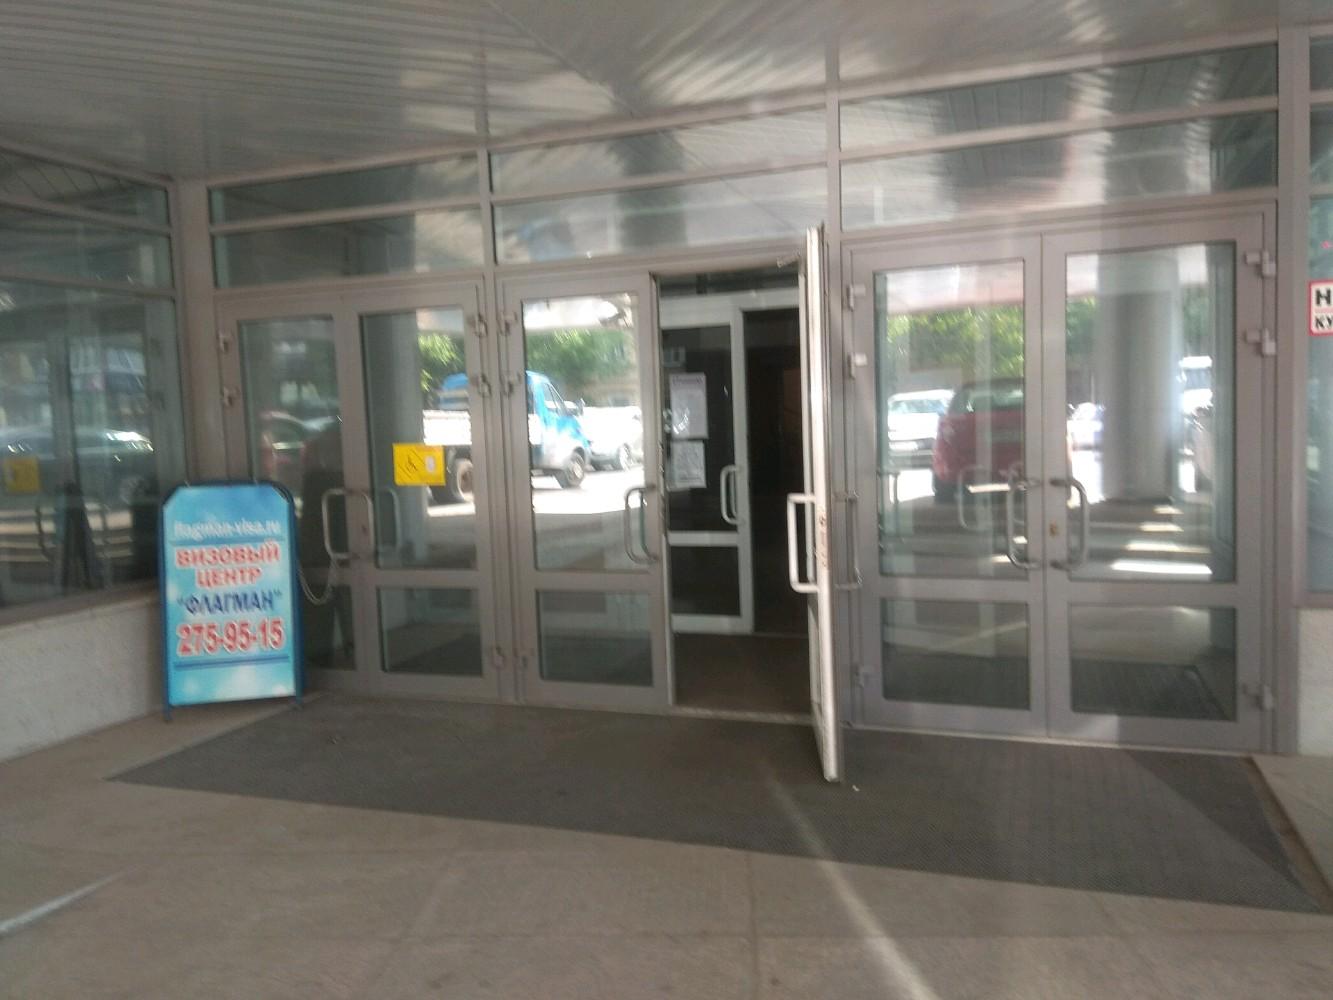 df42569d8 Организации внутри Бизнес-центр Капитал — Яндекс.Карты …